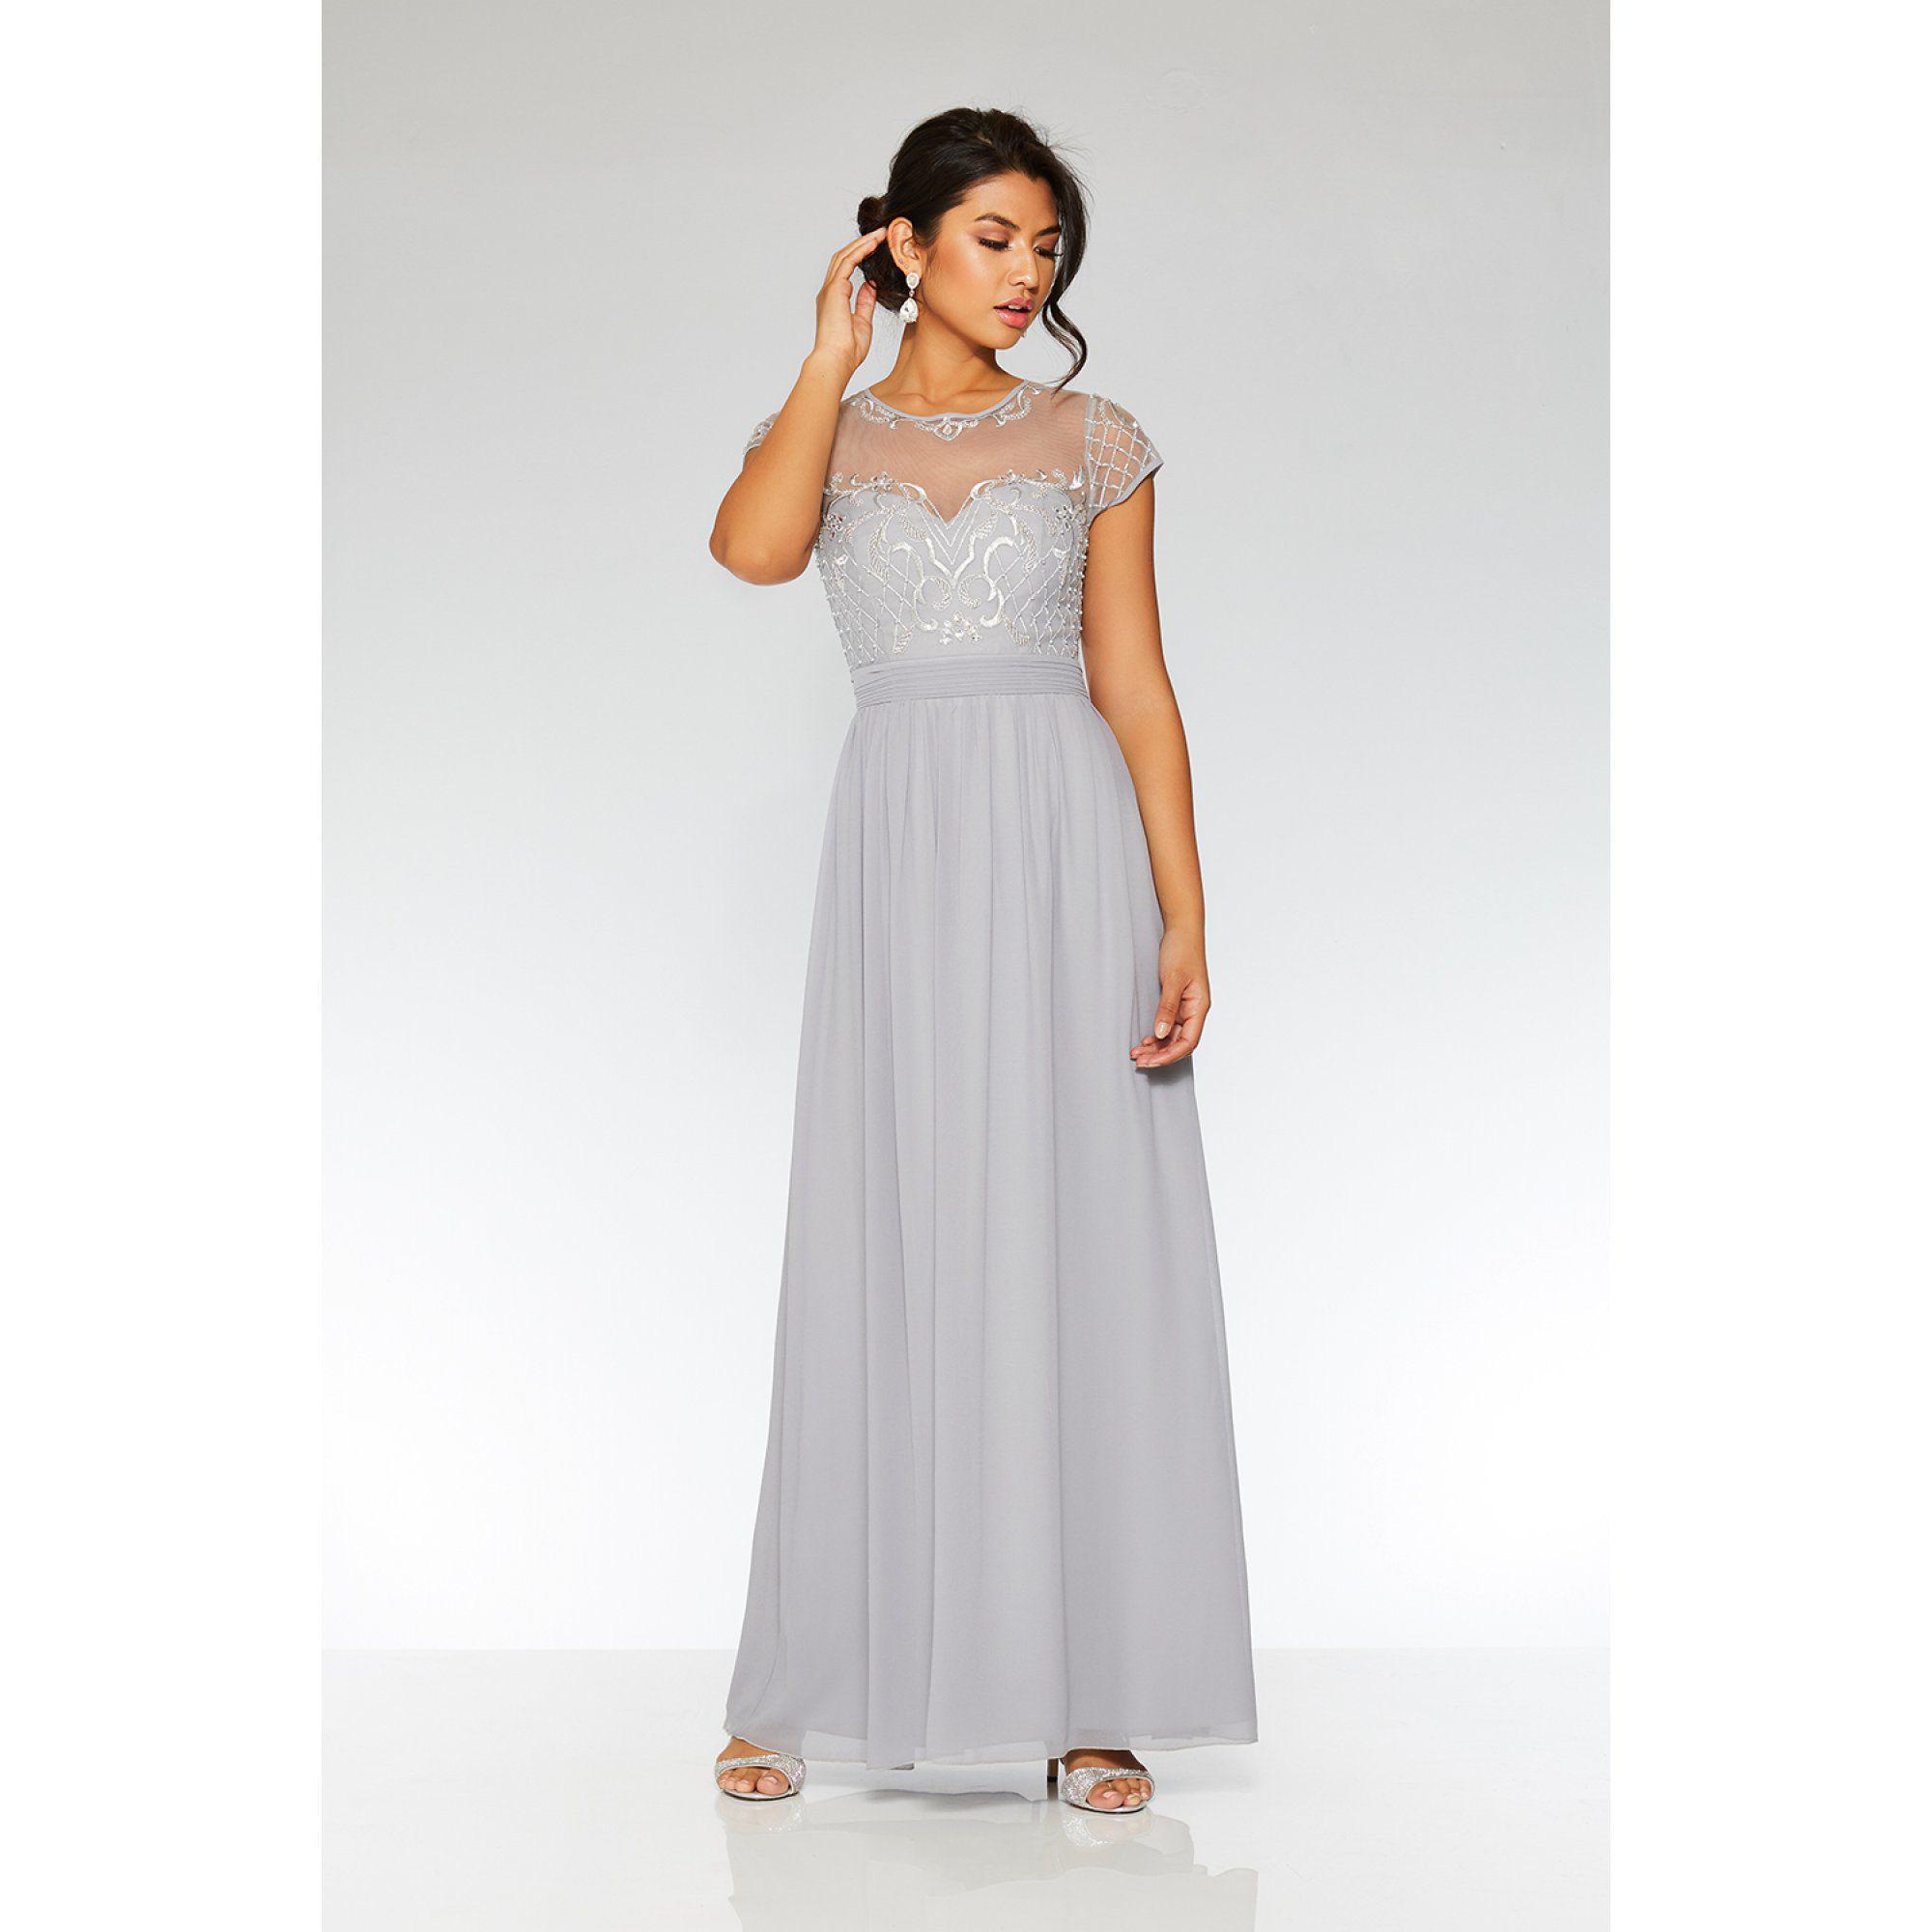 676cbdd6ab1 Quiz Grey Chiffon Cap Sleeve Maxi Dress in Gray - Lyst